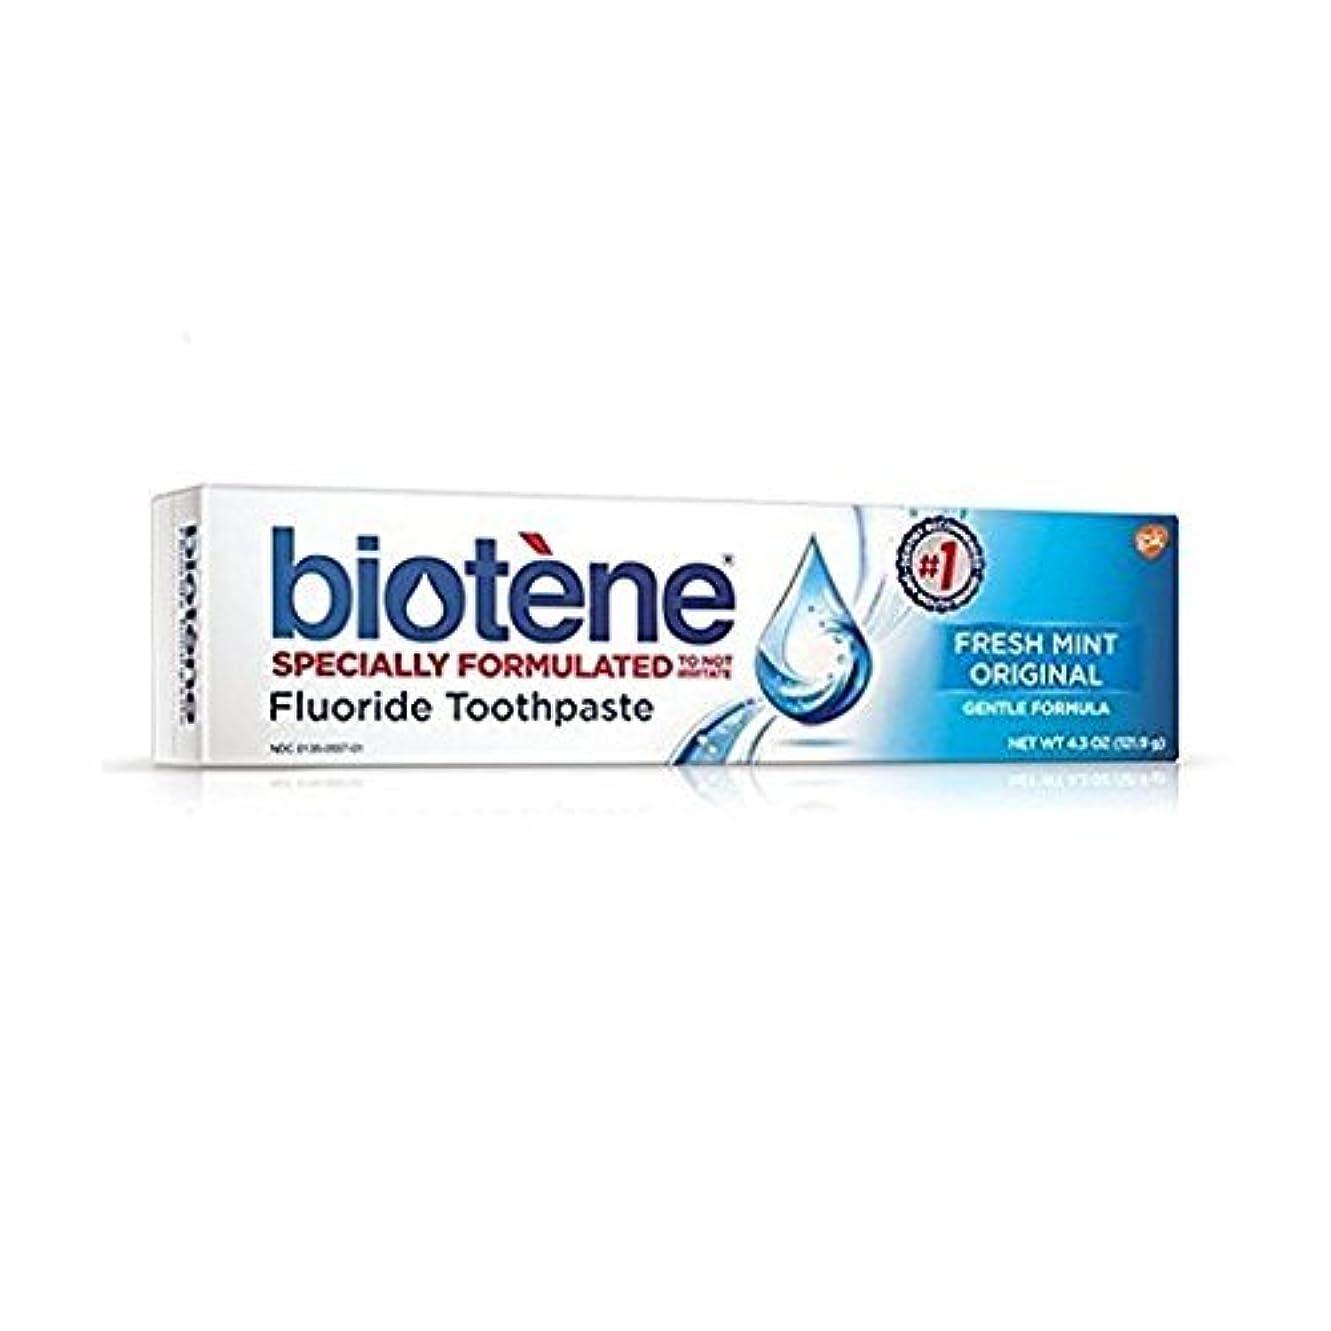 証明書使用法開発Biotene Dry Mouth Fluoride Toothpaste Fresh Mint Original 4.3 Oz. (2 Pack) by Biotene